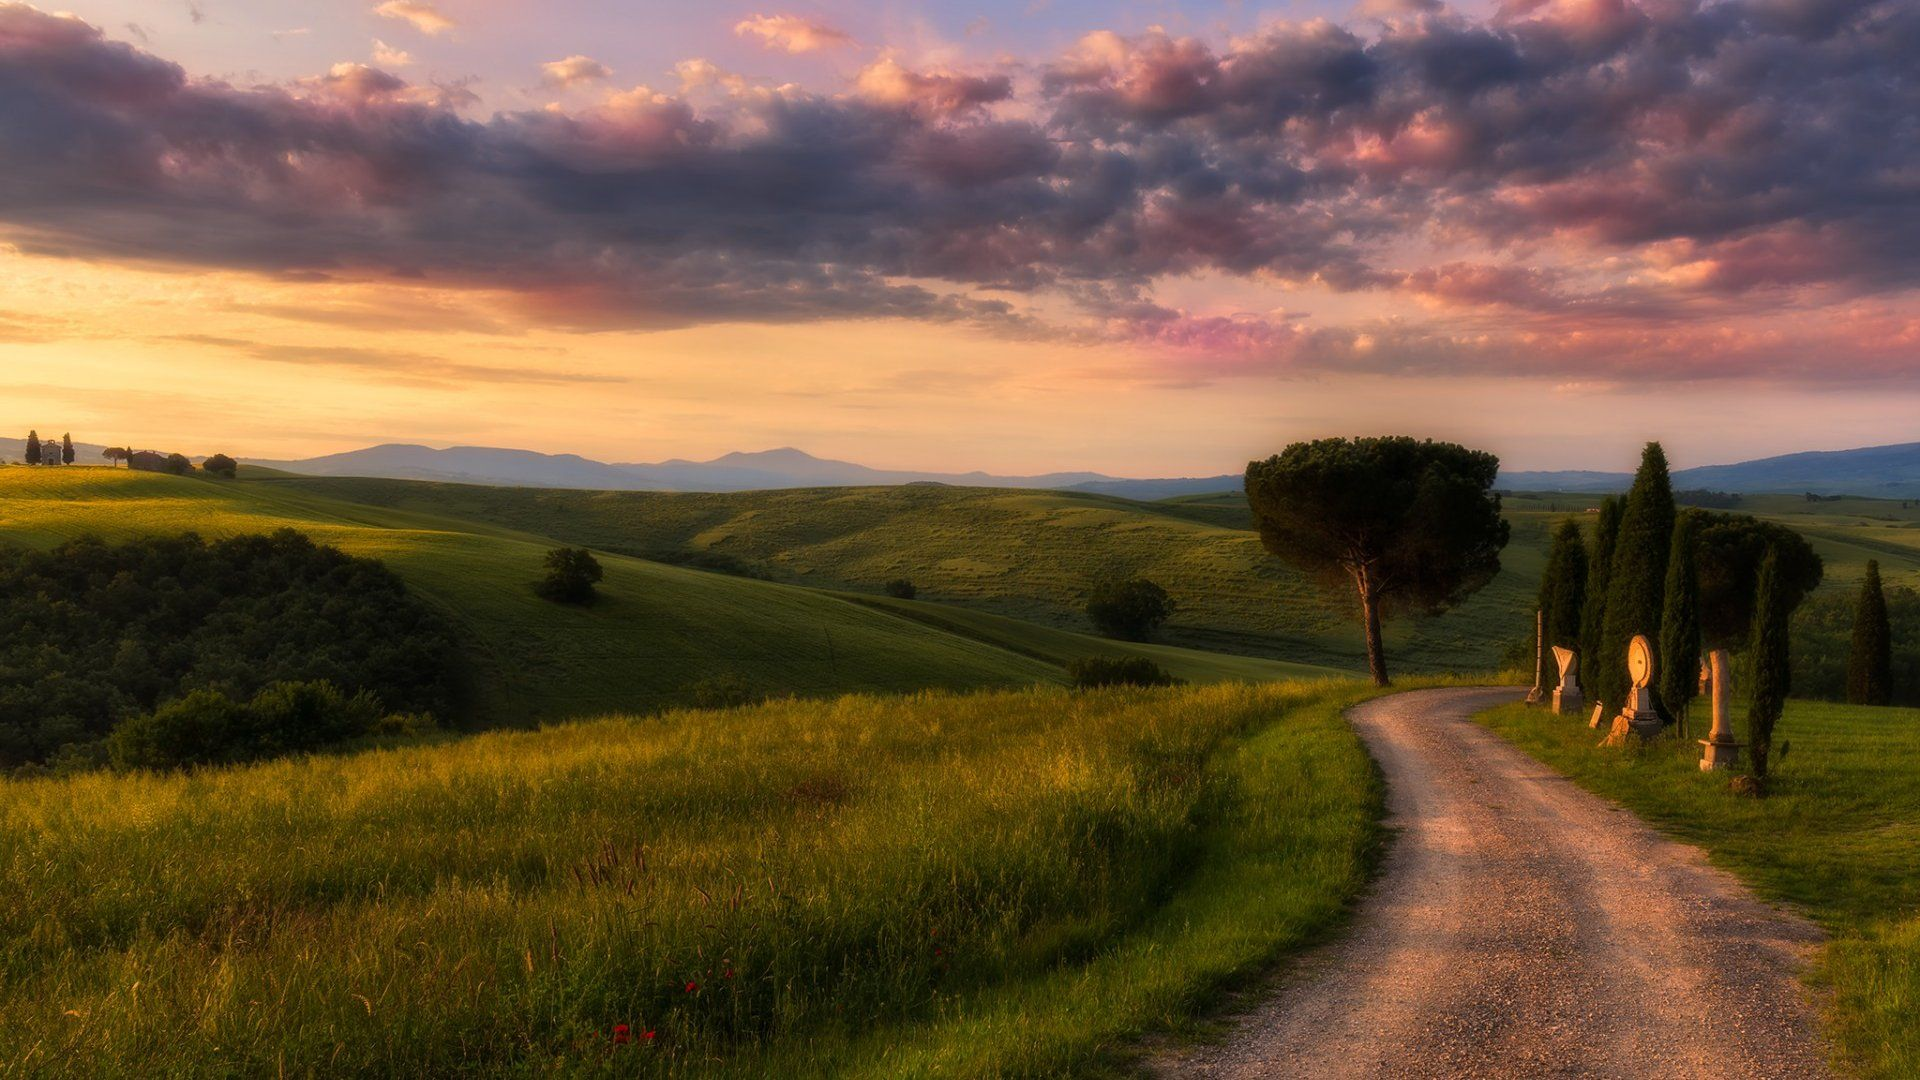 Road Tuscany Landscape